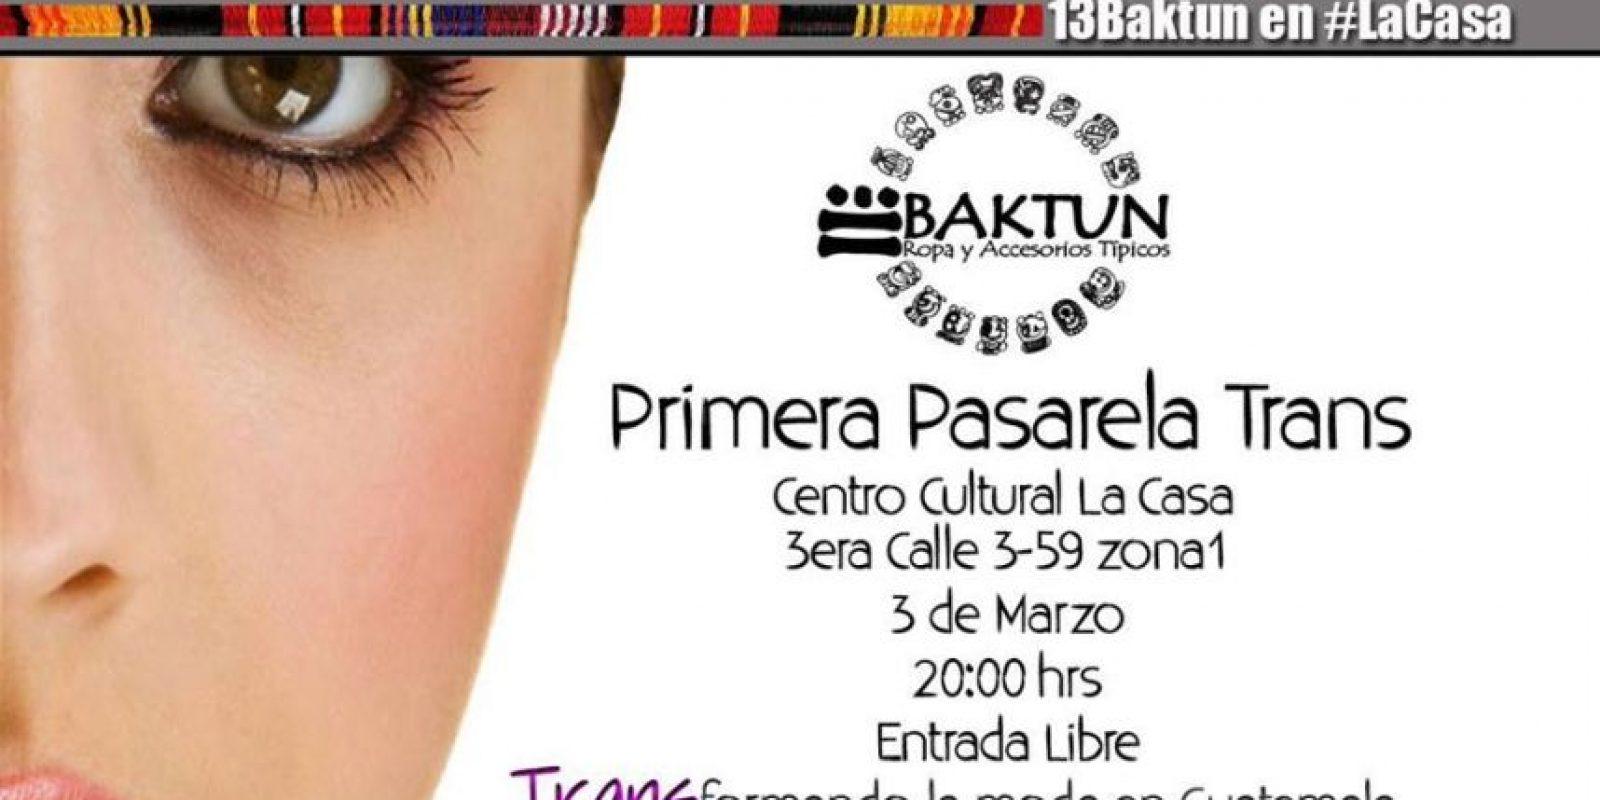 Foto:Facebook/La Casa Centro Cultural